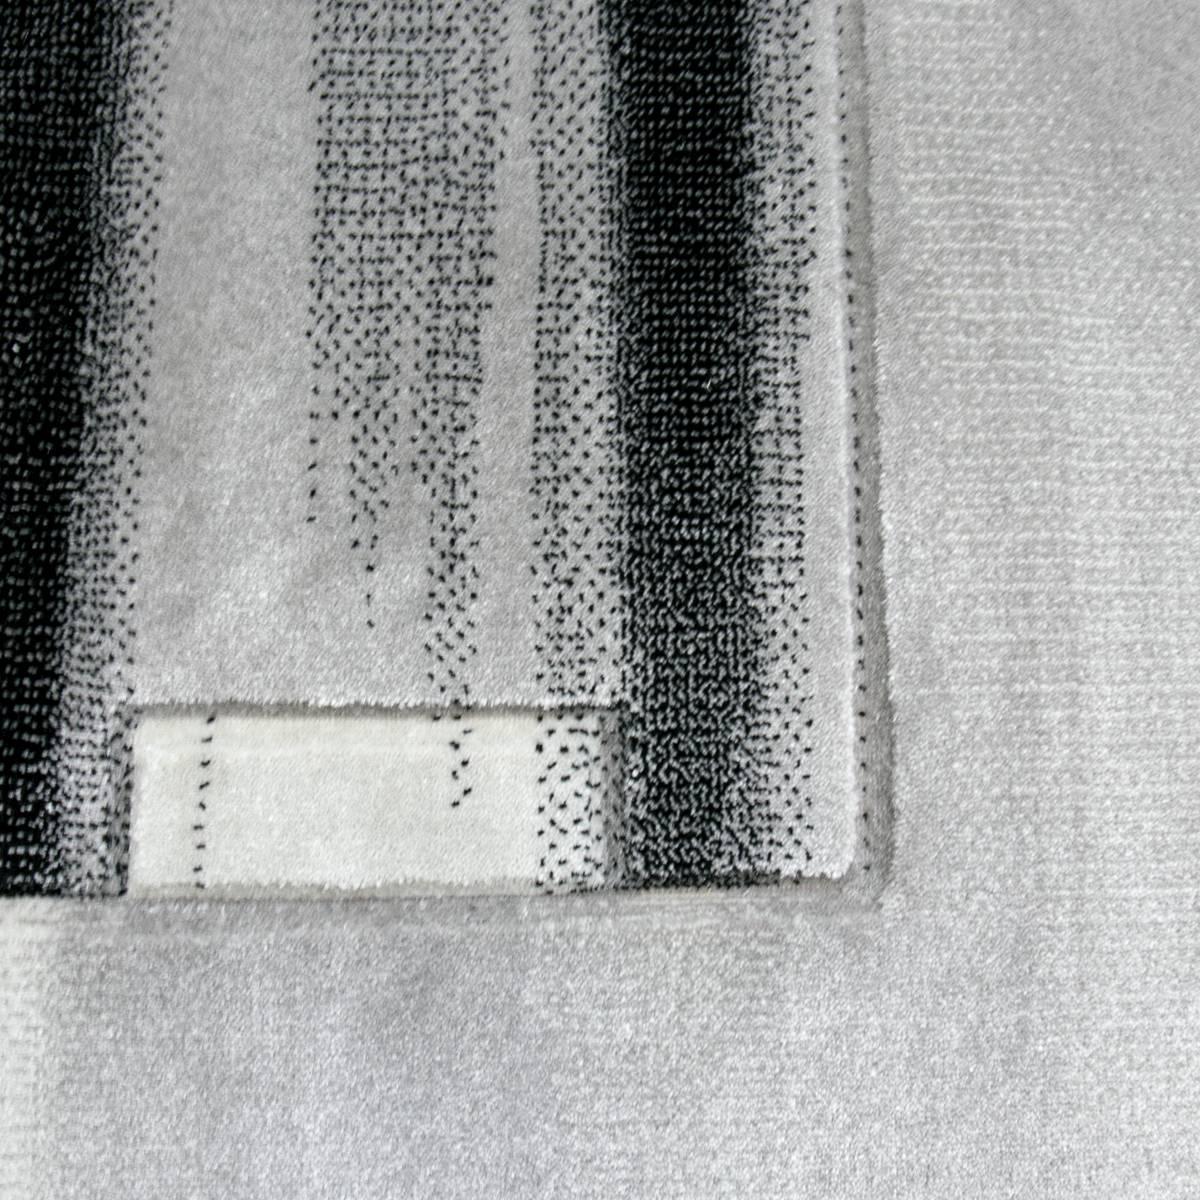 teppich modern designer klassik kariert gestreift in grau versch gr en ebay. Black Bedroom Furniture Sets. Home Design Ideas